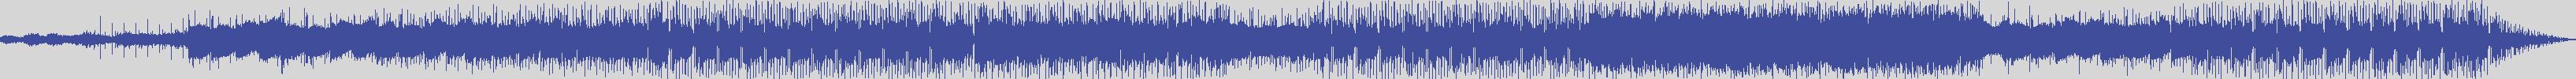 worldwide_music_records [WMR004] Sandsun - Rome [Original Mix] audio wave form